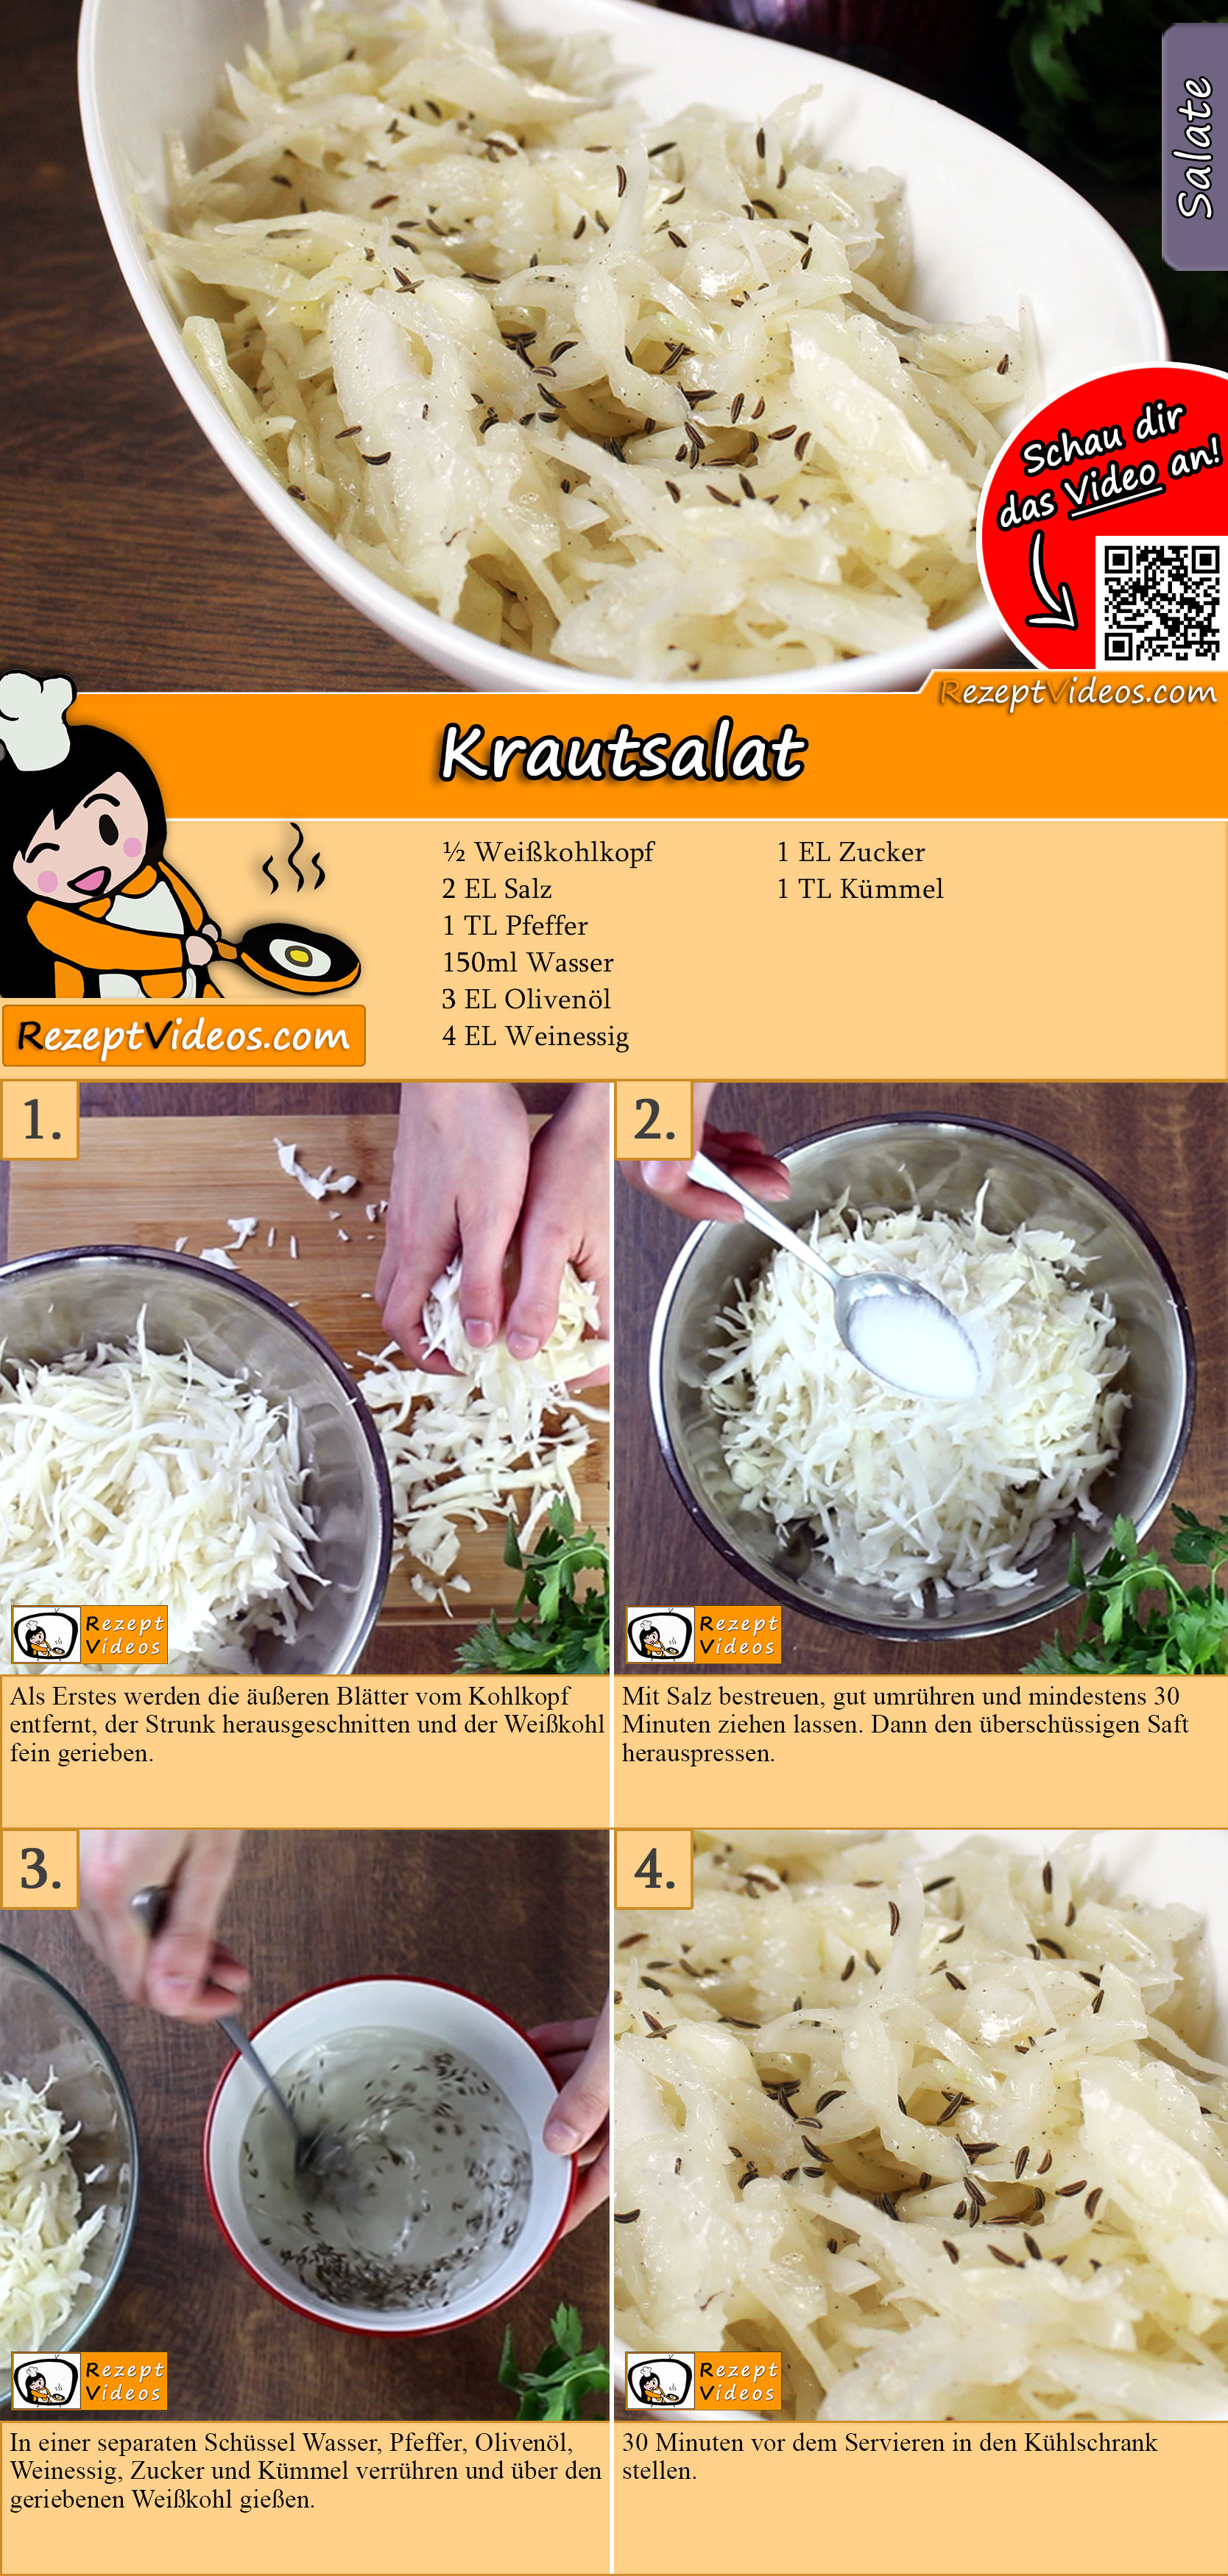 Krautsalat Rezept mit Video